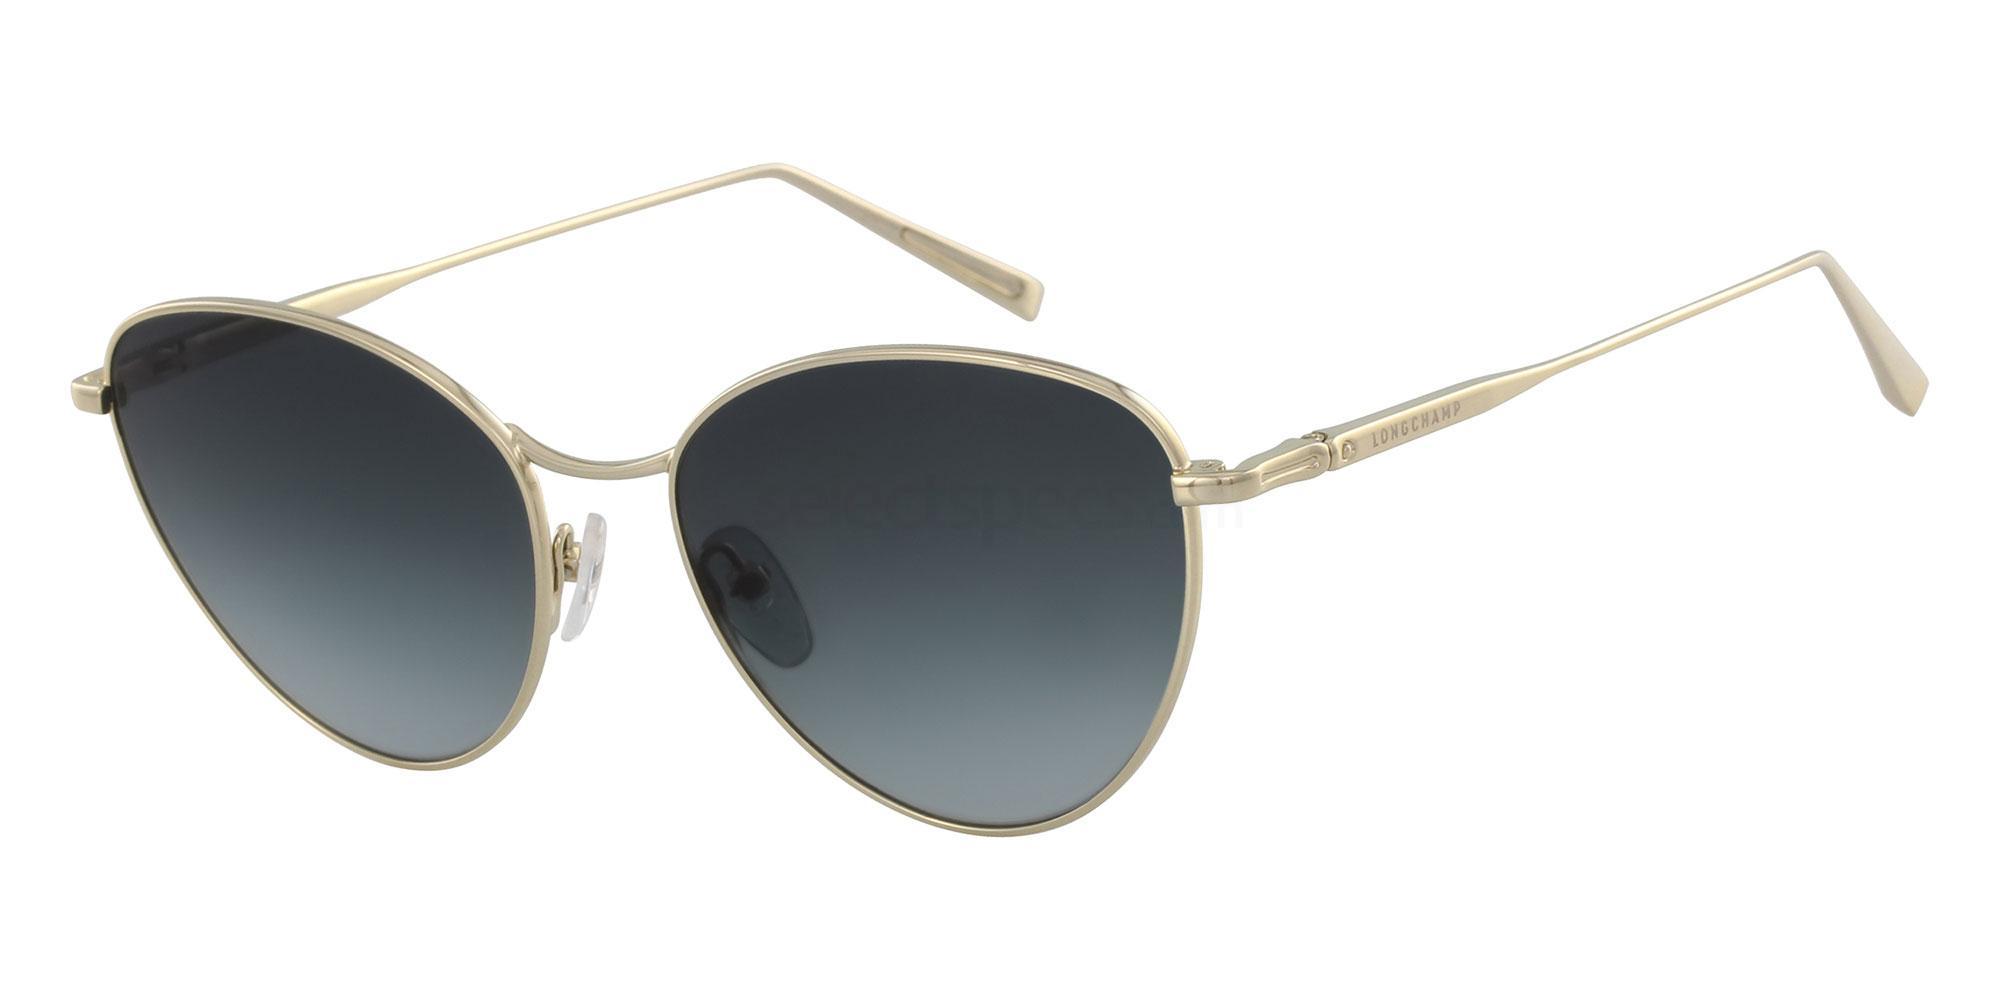 714 LO112S Sunglasses, LONGCHAMP